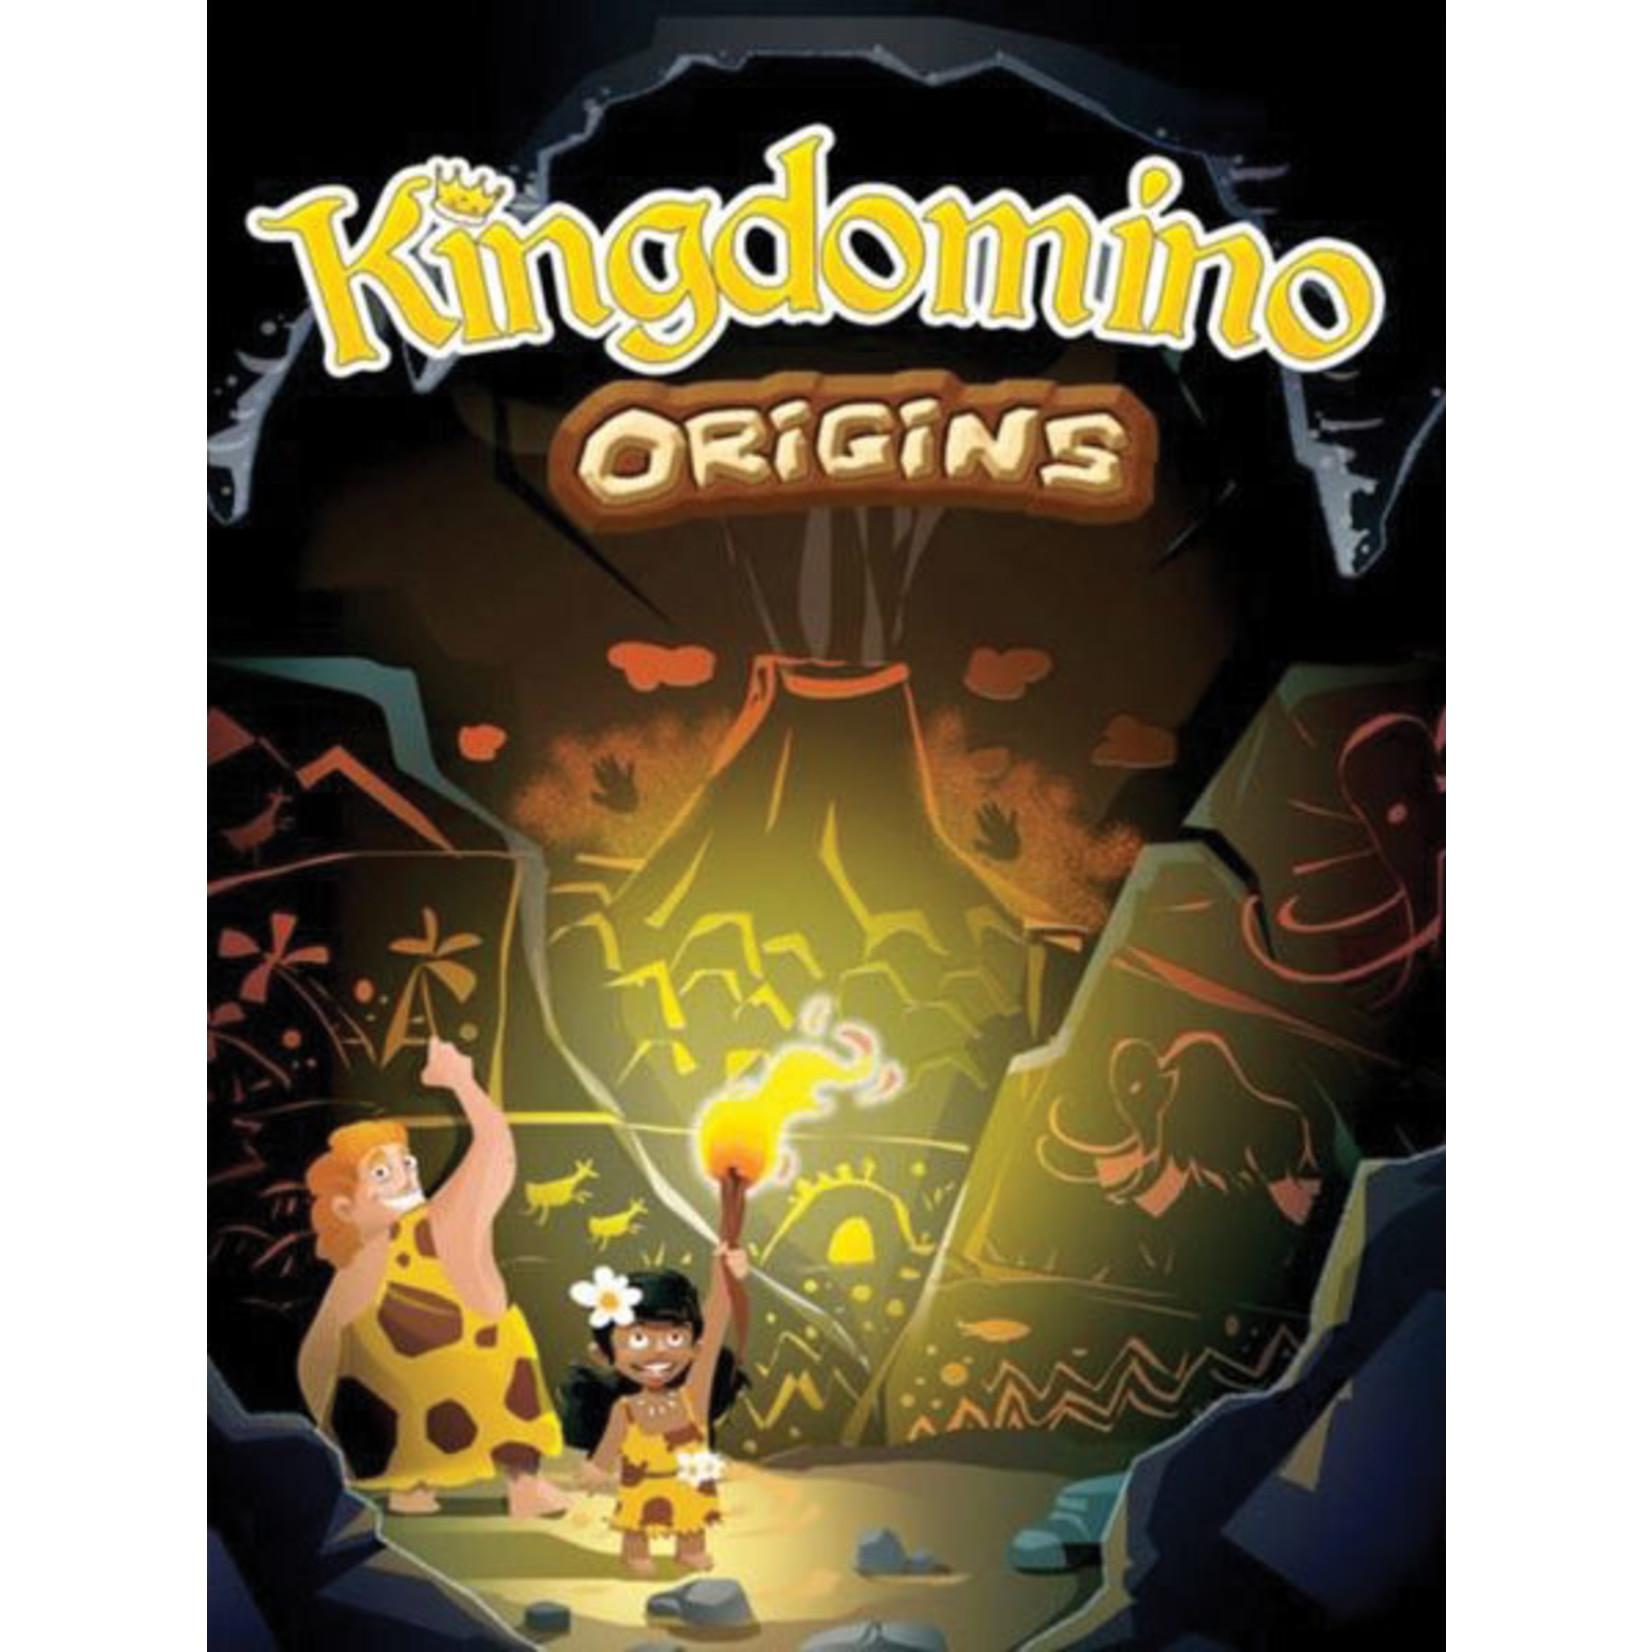 Pre-Order Kingdomino Origins